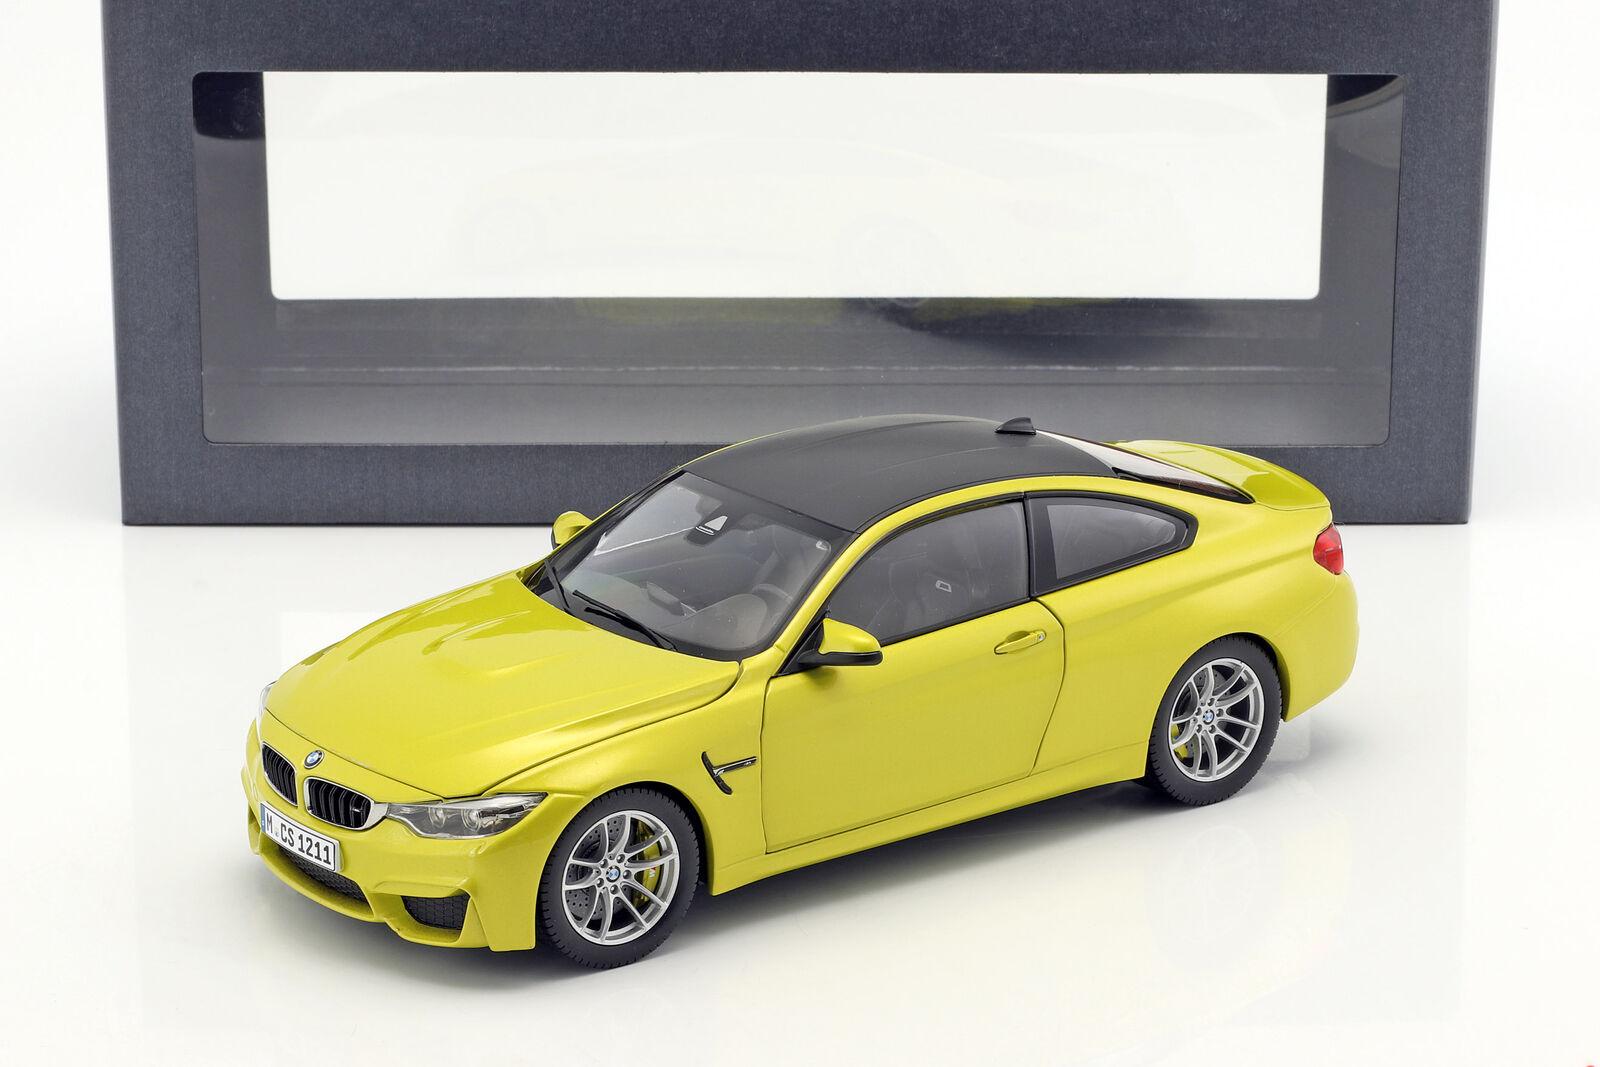 compra limitada BMW M4 M4 M4 Coupé (F82) Austin Amarillo 1 18 Modelos Paragon  ahorra hasta un 50%